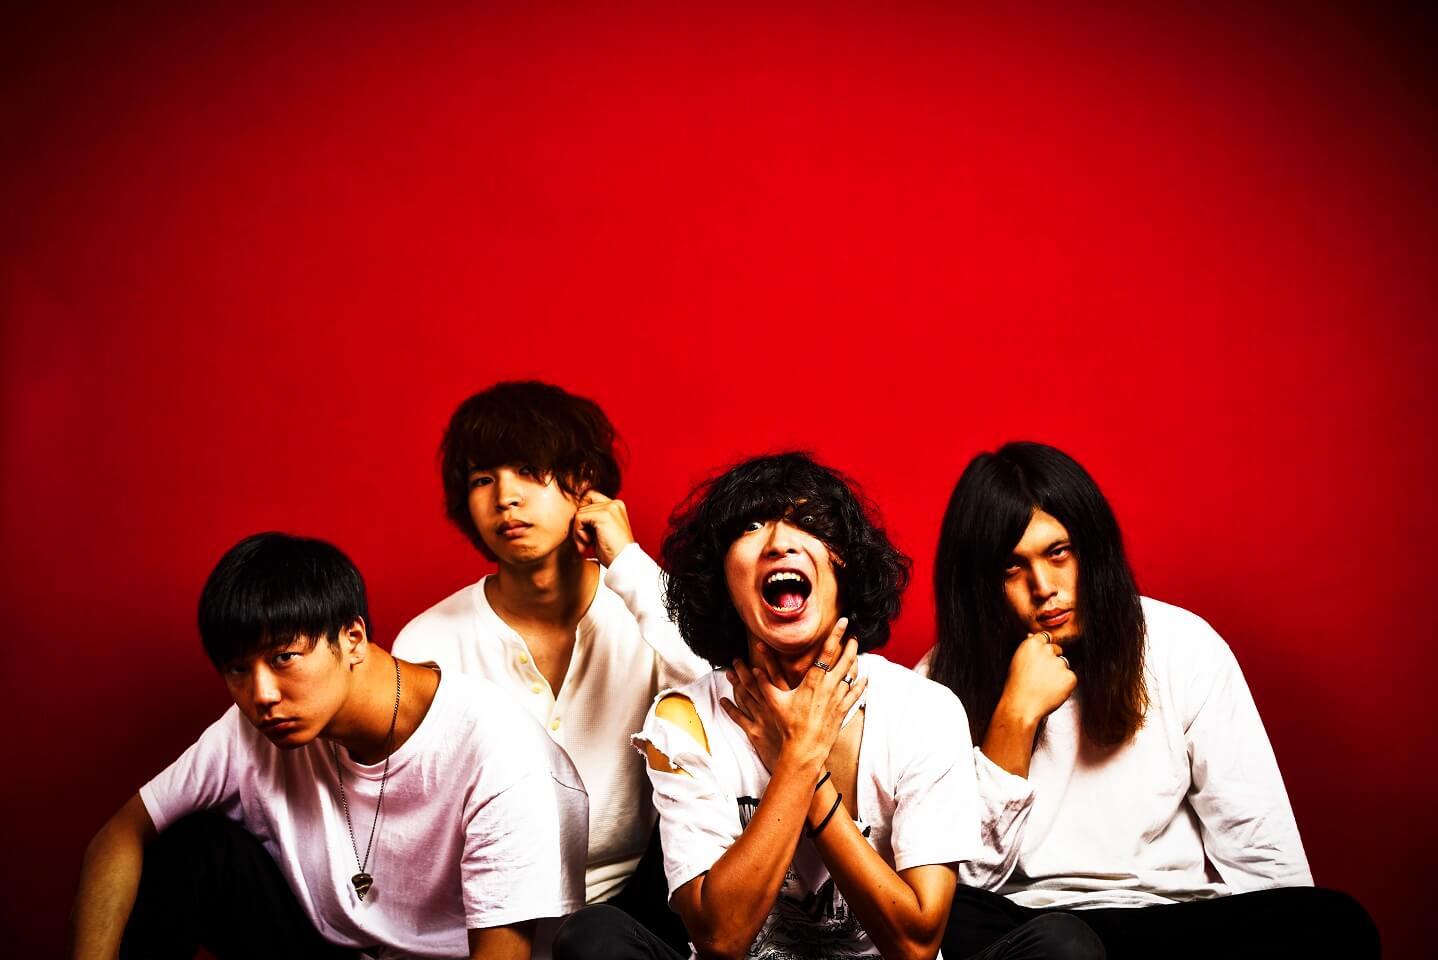 WOMCADOLE、2nd Single「ライター」全曲トレーラー公開!ツアー第2弾ゲストバンドも発表サムネイル画像